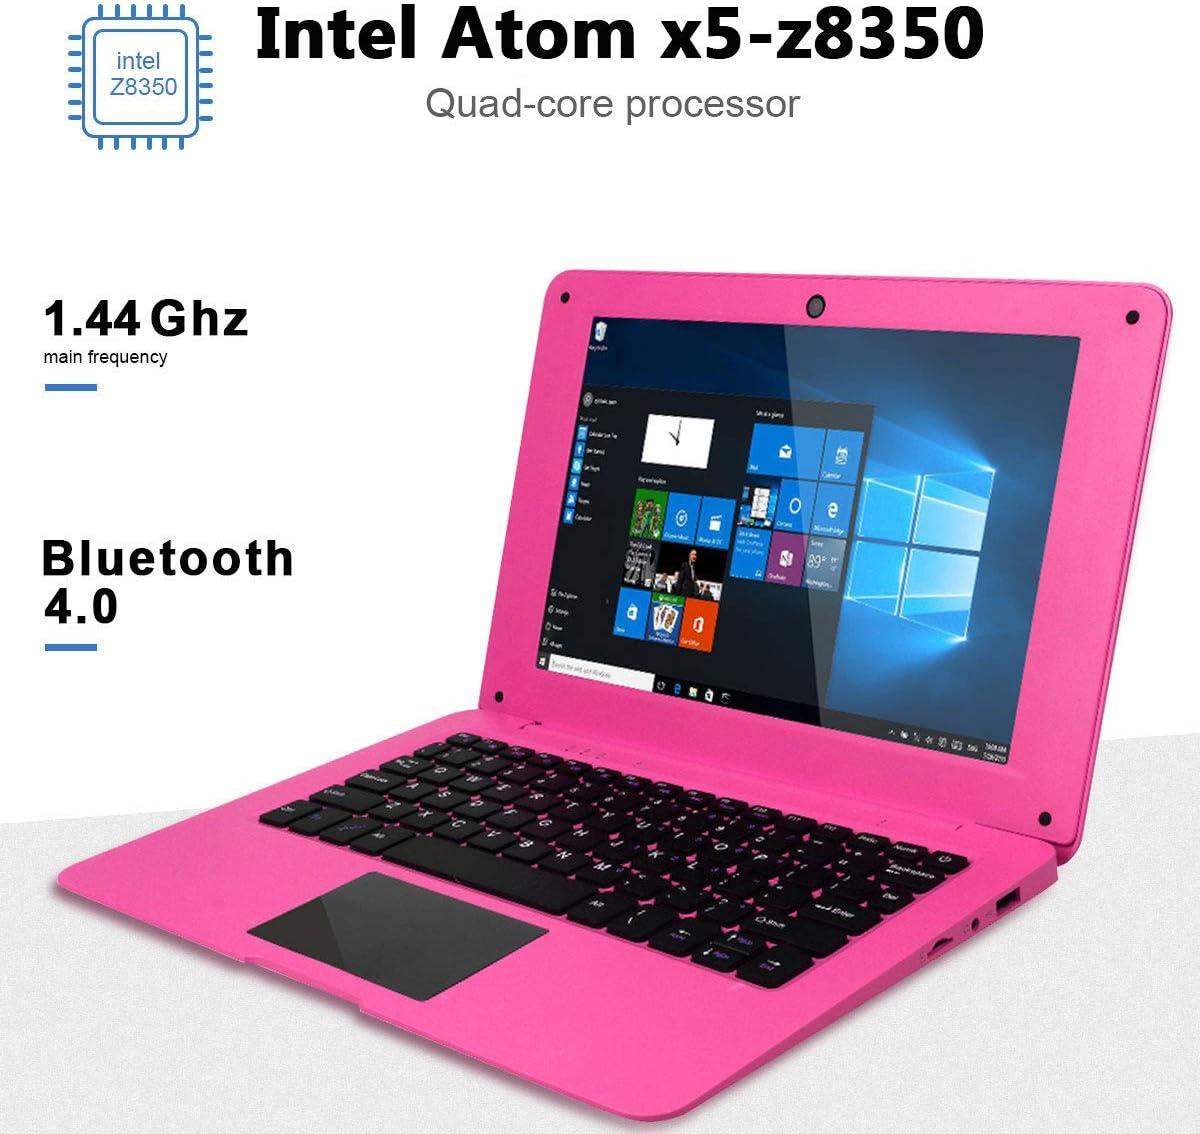 BT WiFi Blue Supports 128GB tf-Card Notebook Computer Intel Quad Core 1.44Ghz USB 3.0 2GB RAM 32GB Storage HSW 10.1 inch Windows 10 Ultra Thin Laptop PC HDMI